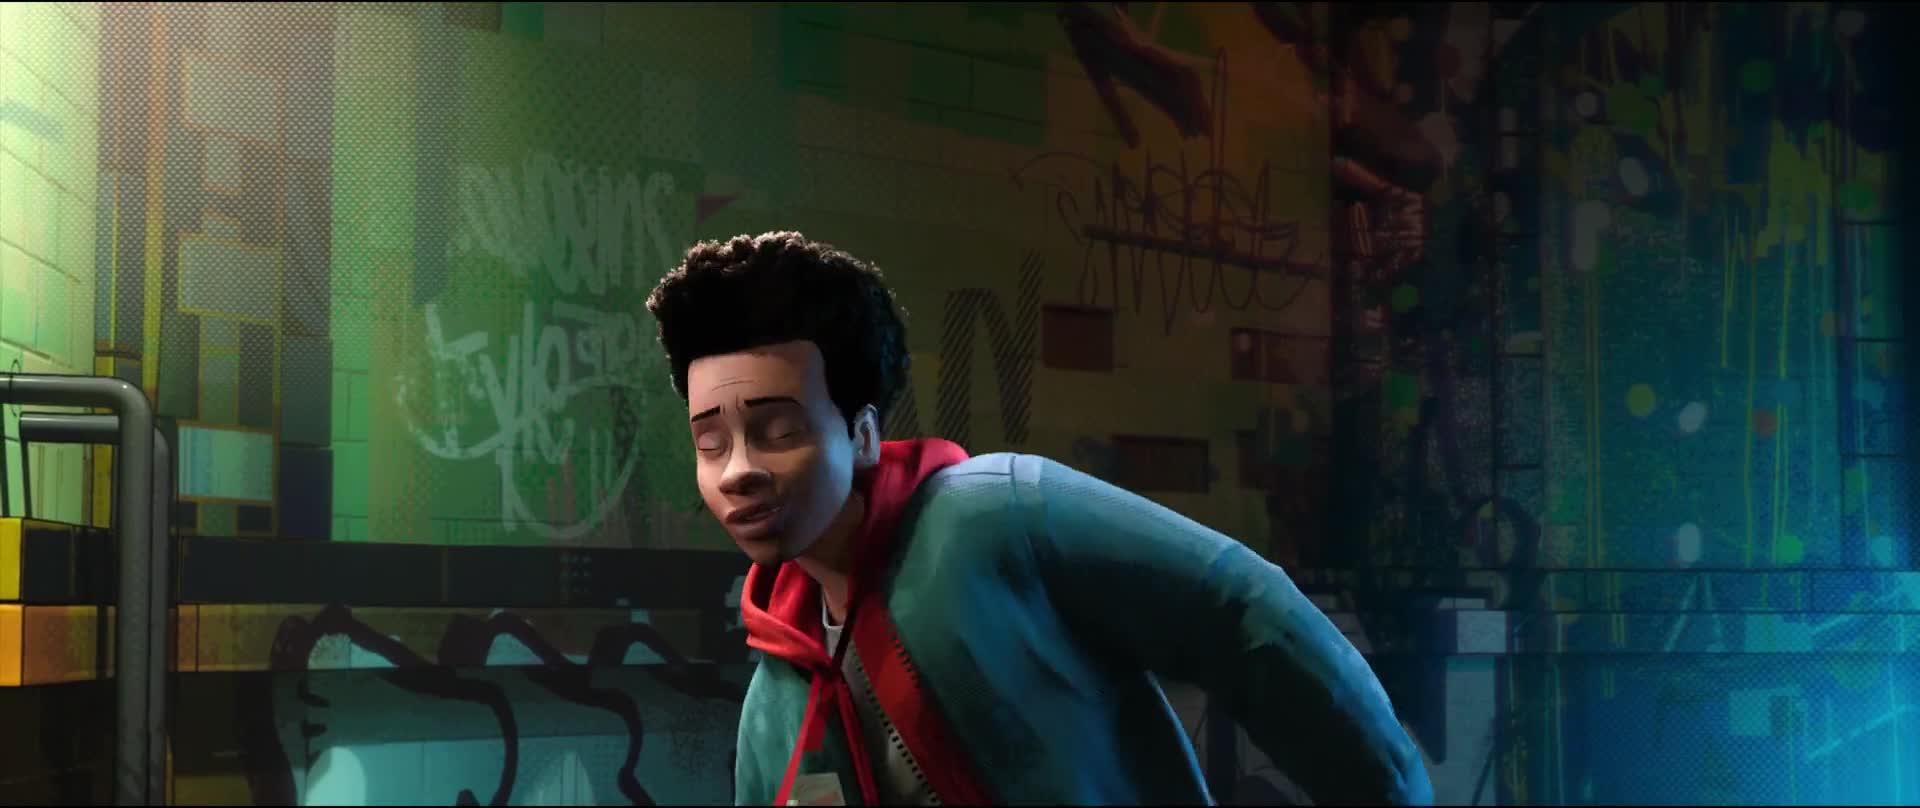 SpiderMan Paralelni svety 2018 CZ dabing HD